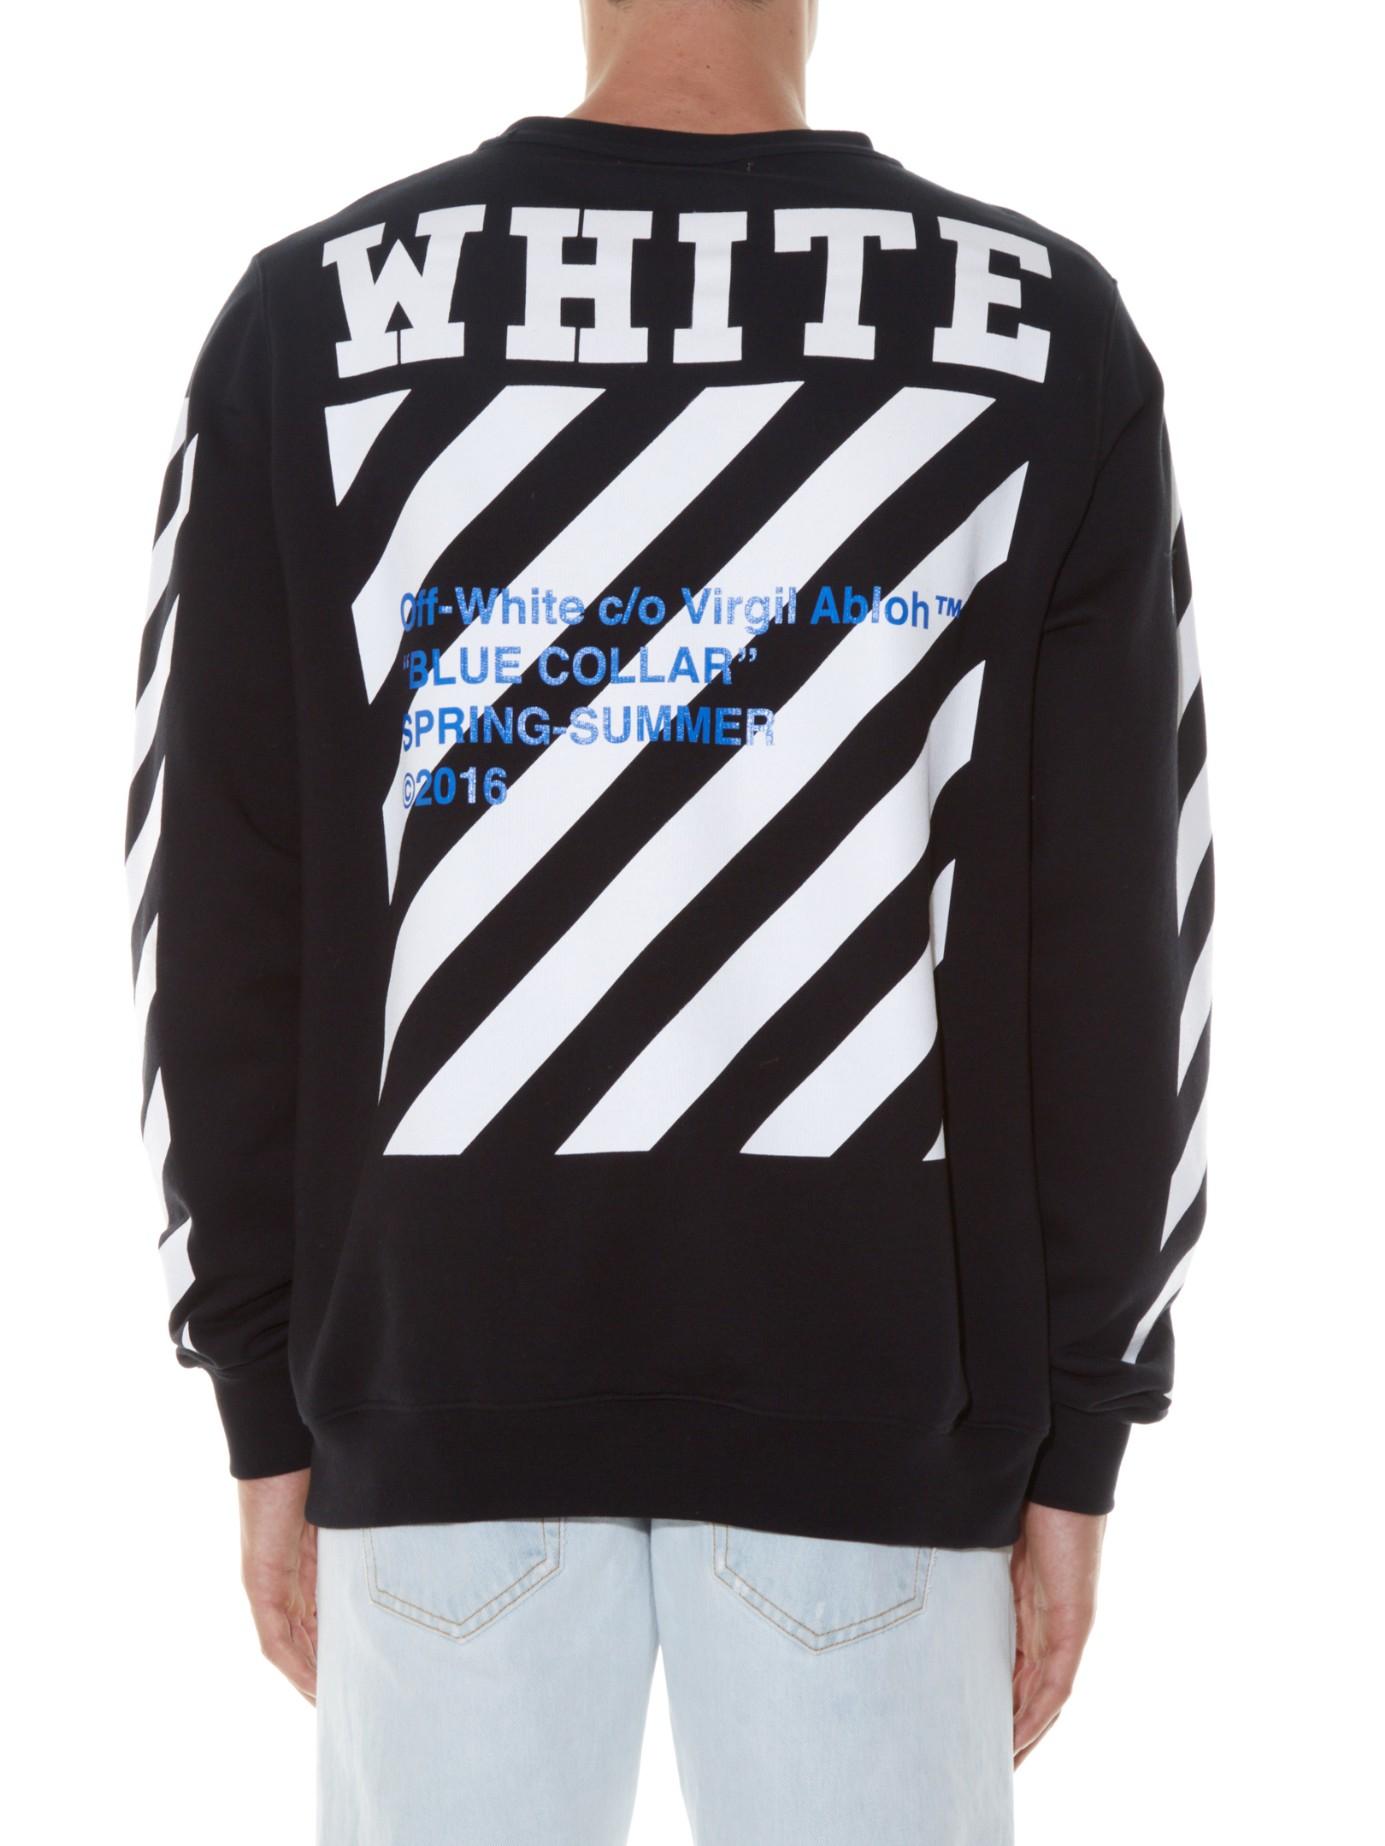 87daedcdb3ff Lyst - Off-White c o Virgil Abloh Logo-print Sweatshirt in Black for Men